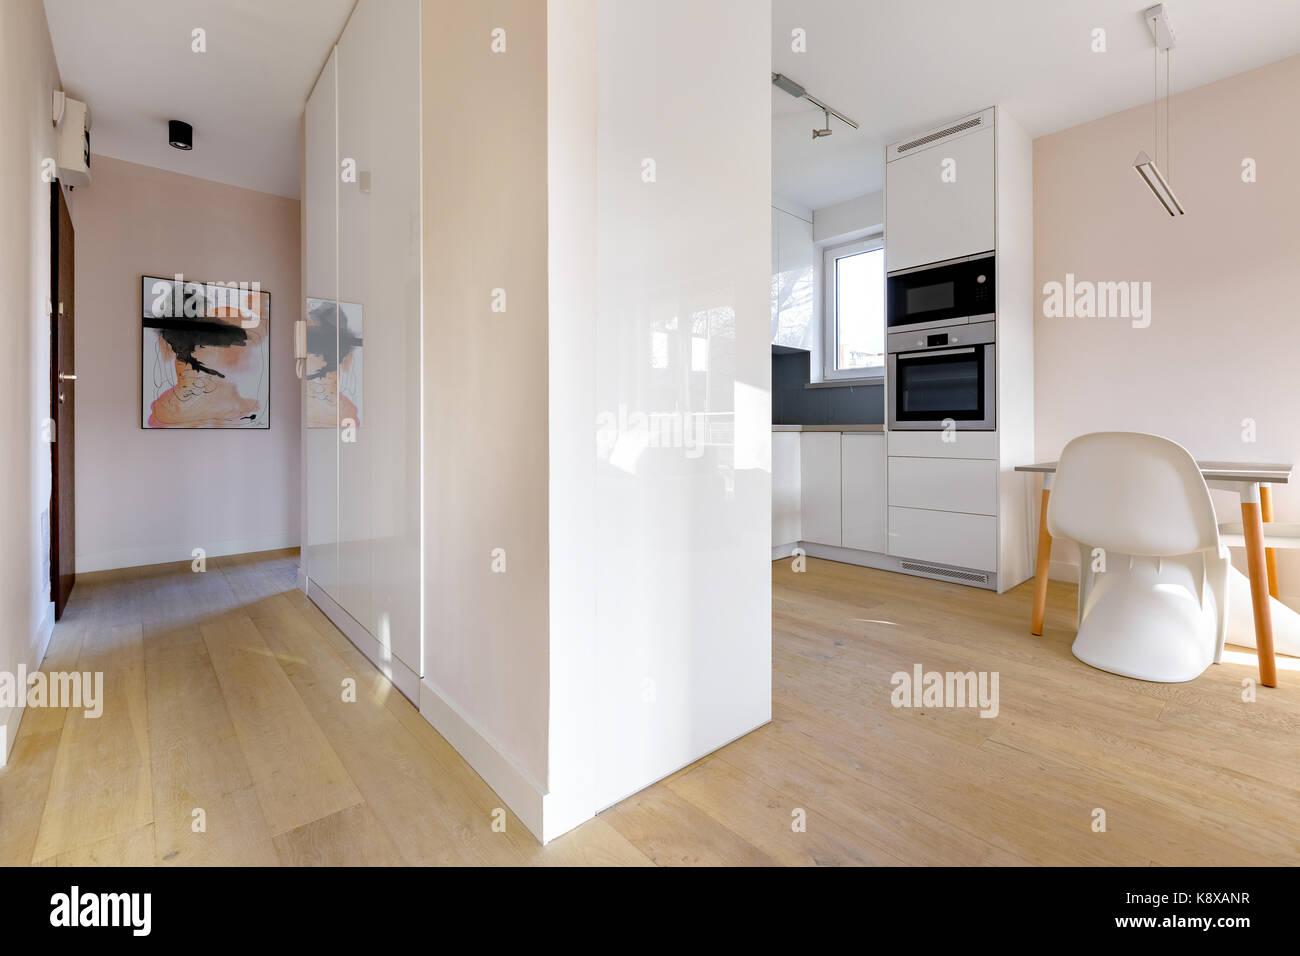 Casa Moderna Interni, Vista Dal Corridoio Per Cucina